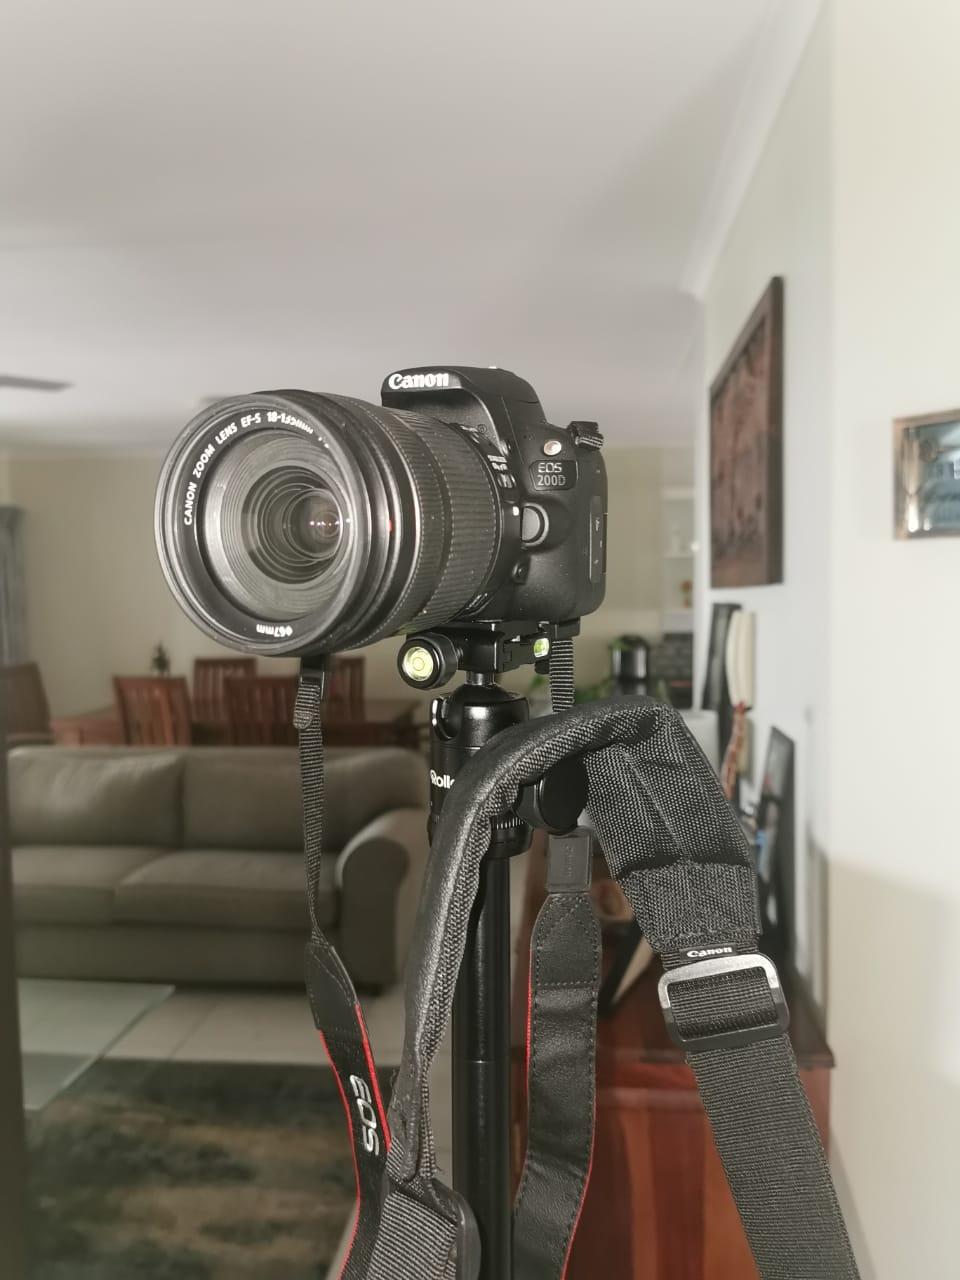 Canon EOS200 D Camera + Bag + 18-135mm Lens +Tripod + Nikon Binoculars- all as new